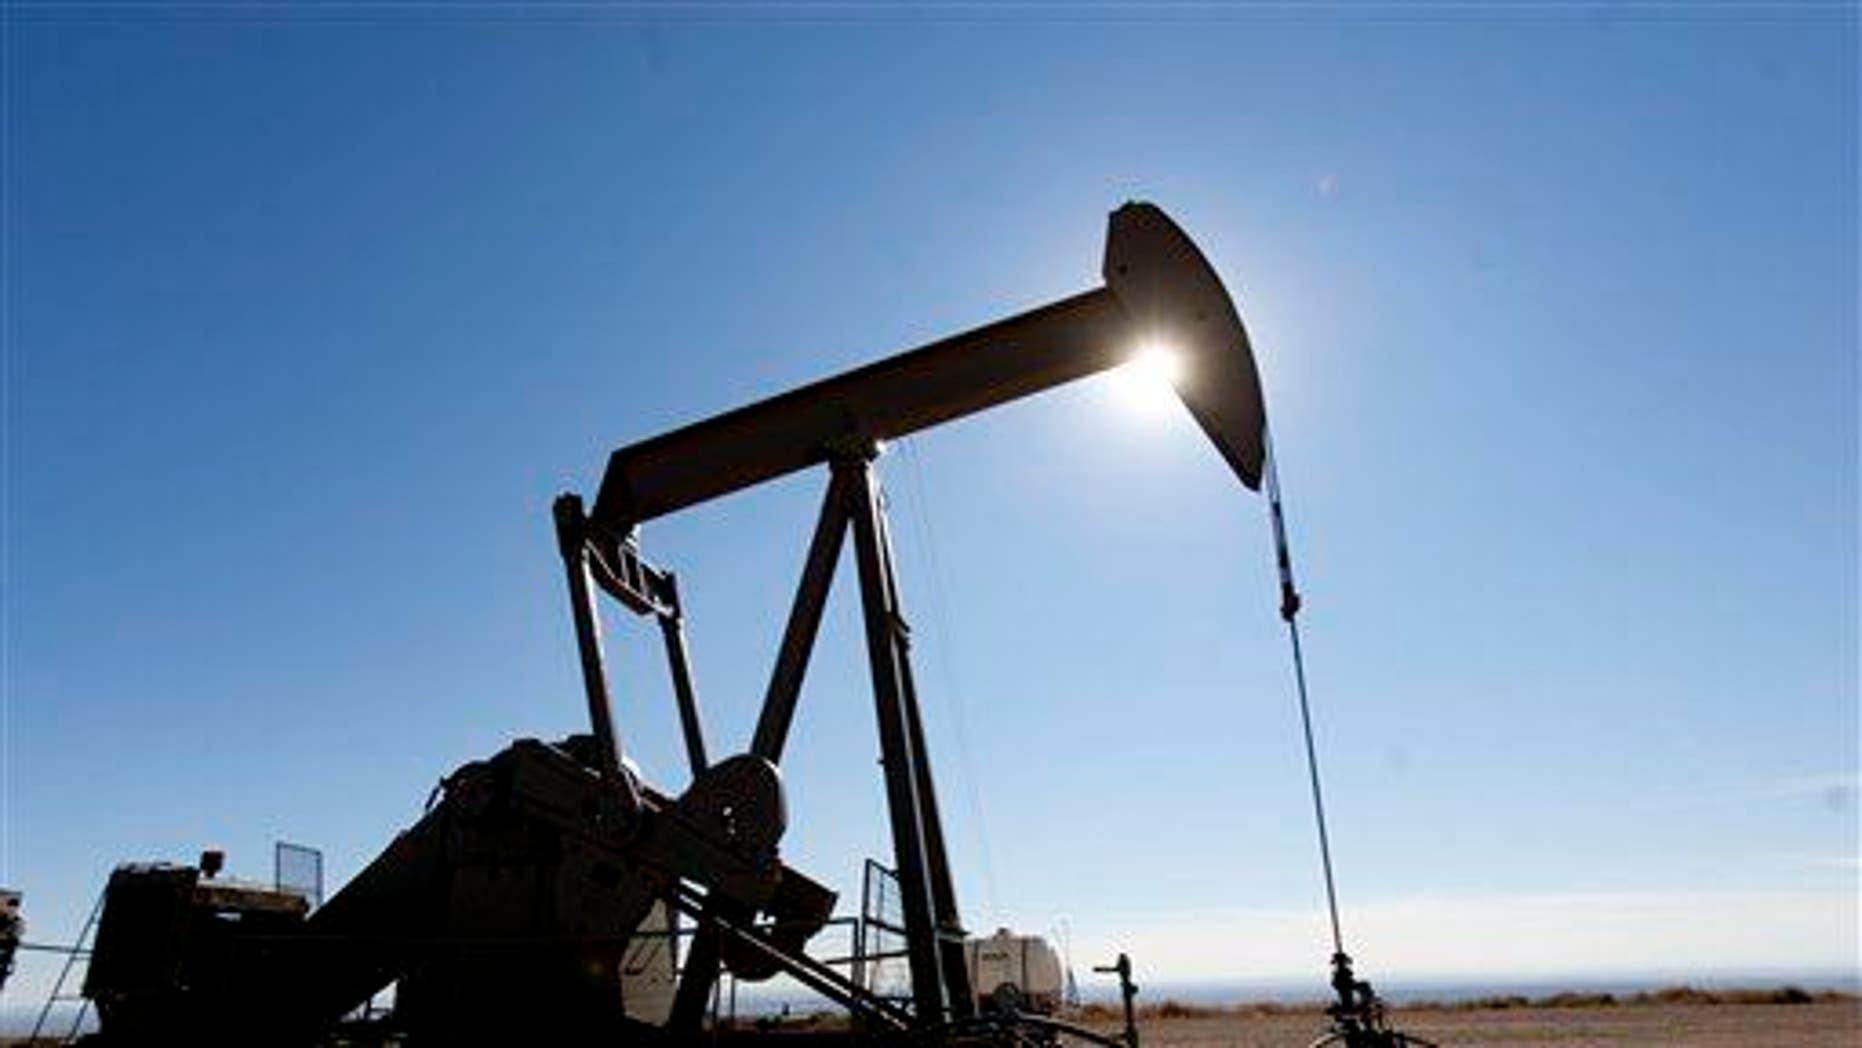 This photo taken Feb. 7, 2012 shows the oil fields of the Uintah Basin, southeast of Vernal, Utah.